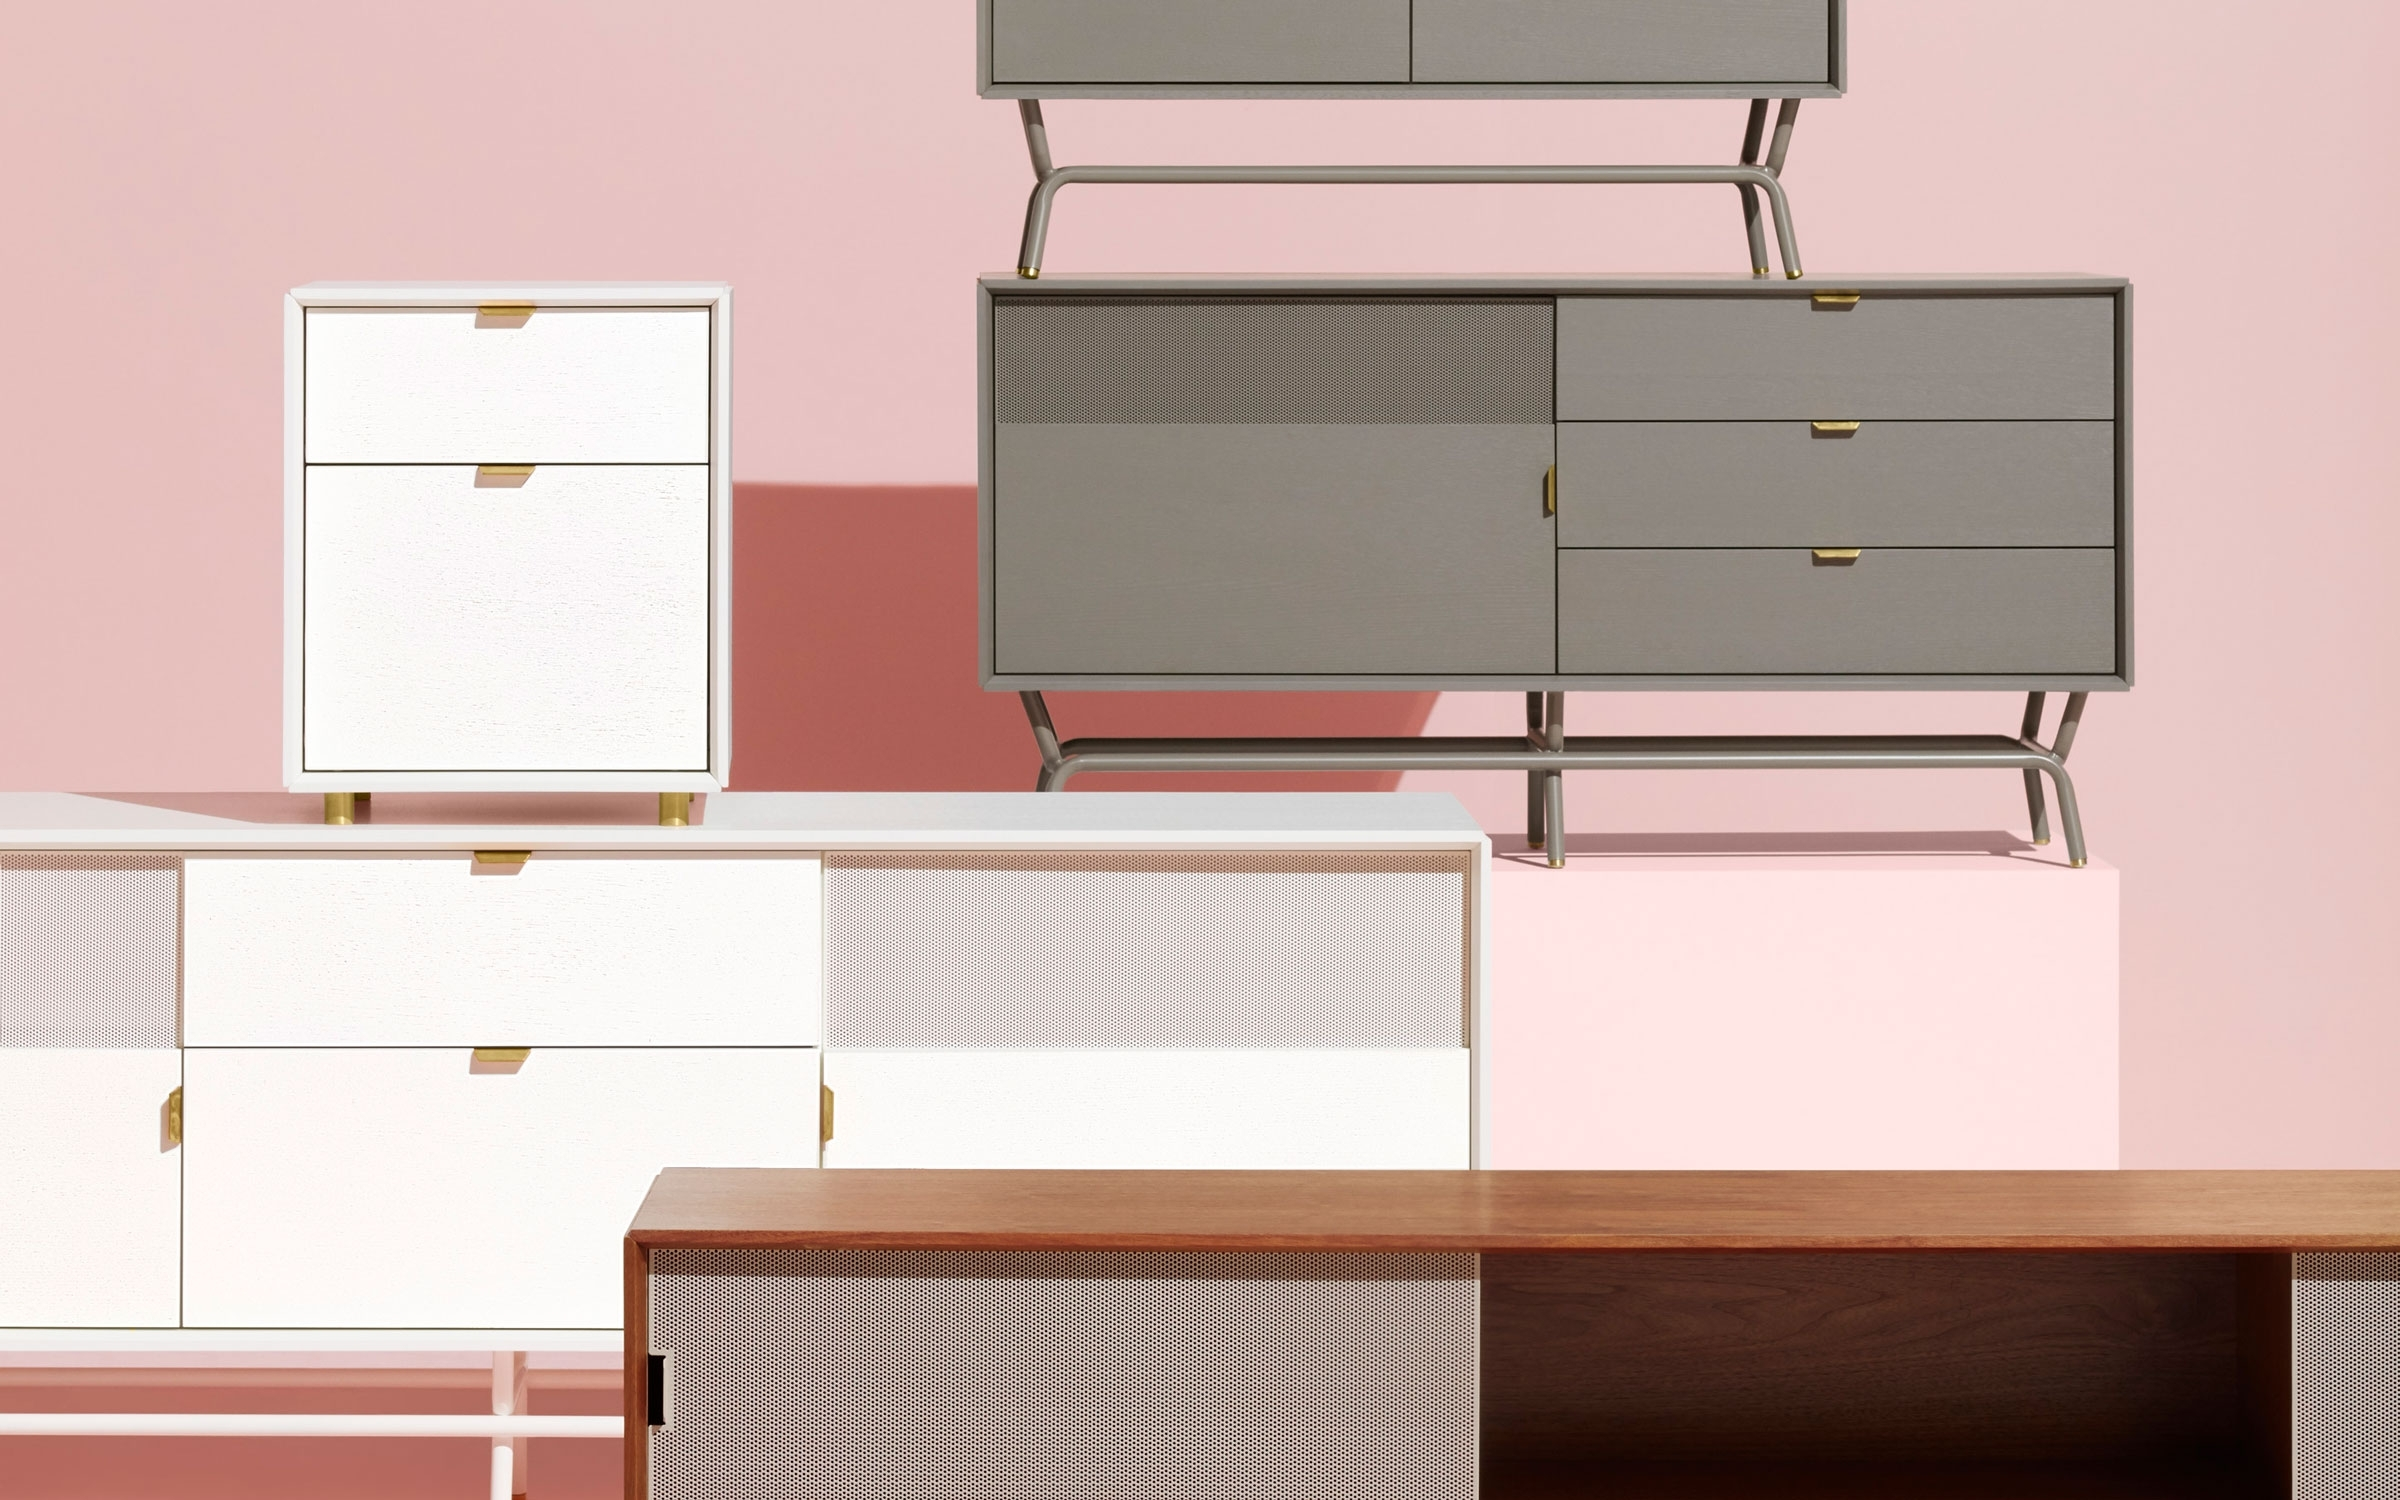 Dang 1 Door / 3 Drawer Console - Modern Credenza | Blu Dot within Walnut Finish 2-Door/3-Drawer Sideboards (Image 9 of 30)